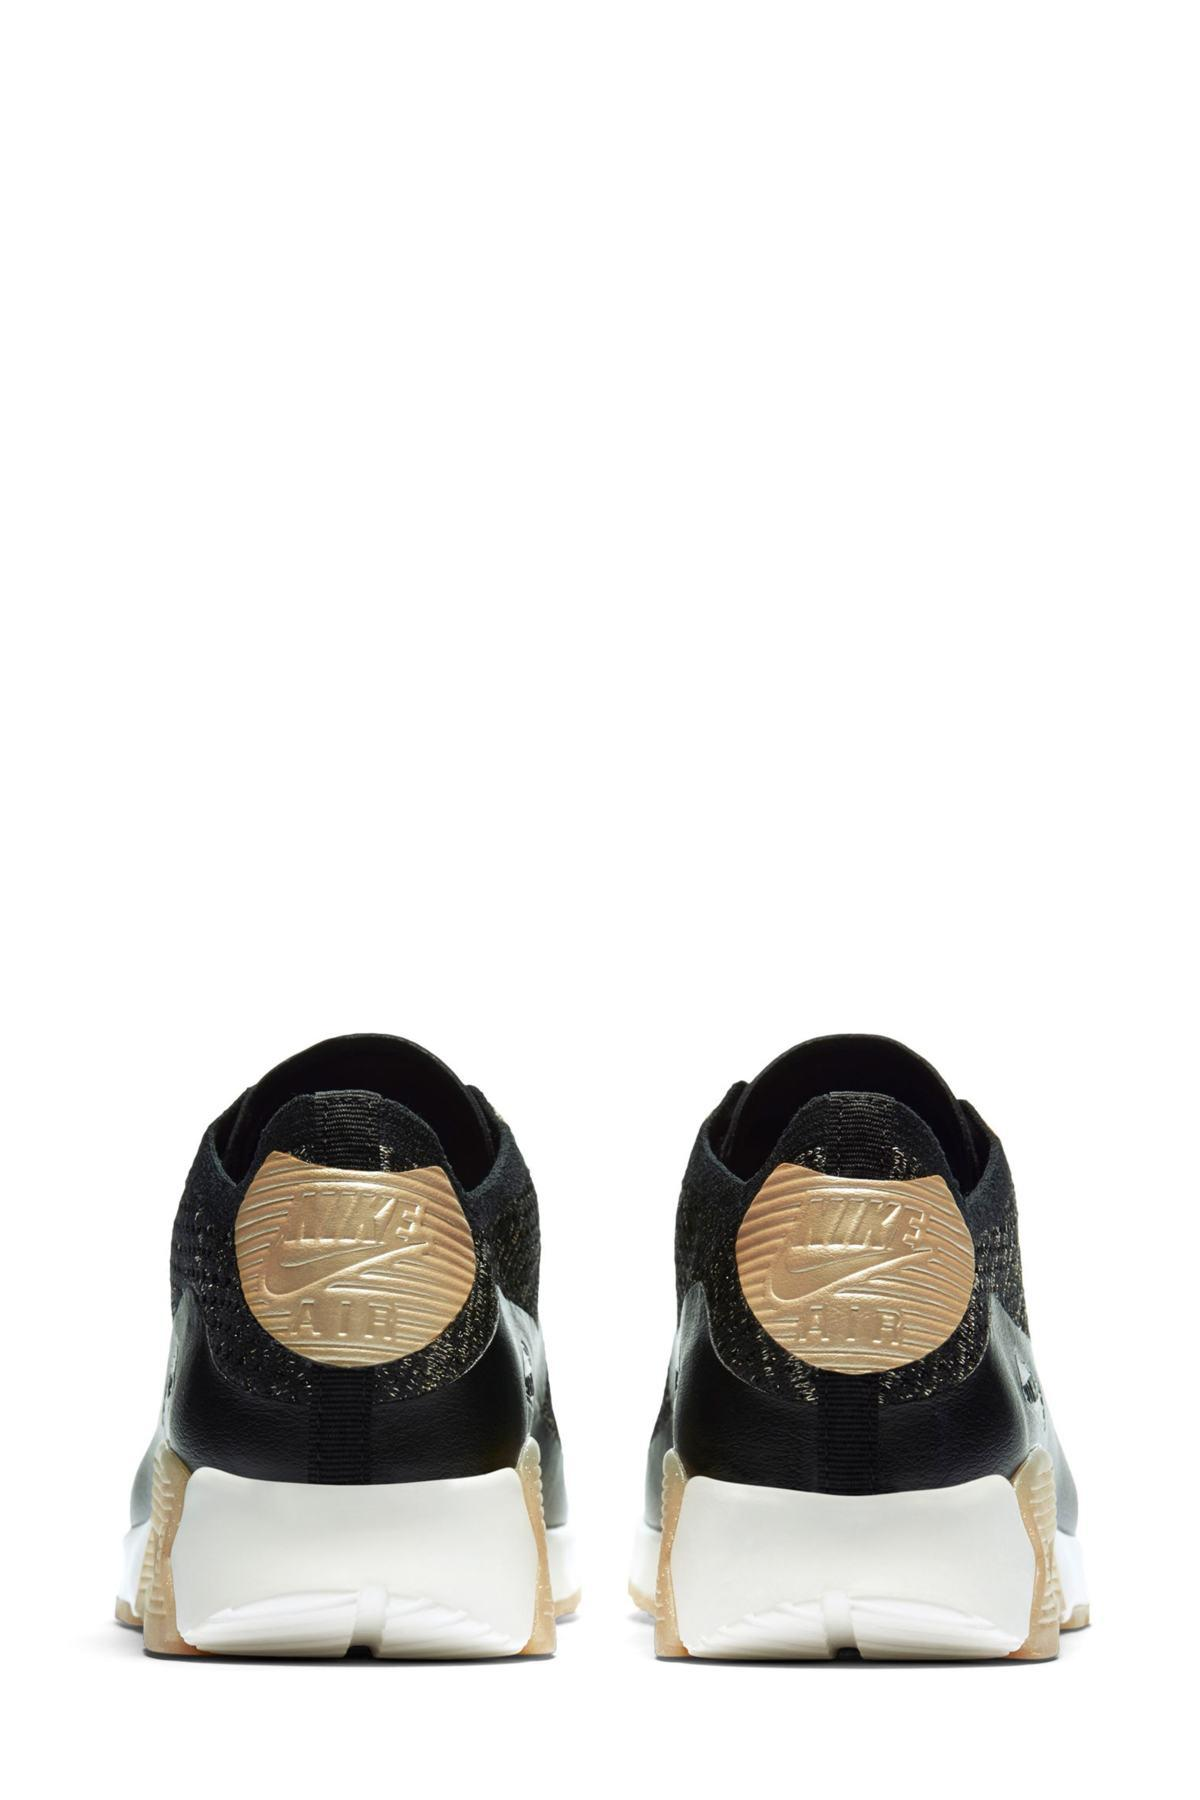 timeless design 3cd2c eb2e3 Lyst - Nike Air Max 90 Ultra 2.0 Flyknit Metallic Sneaker (women) in ...